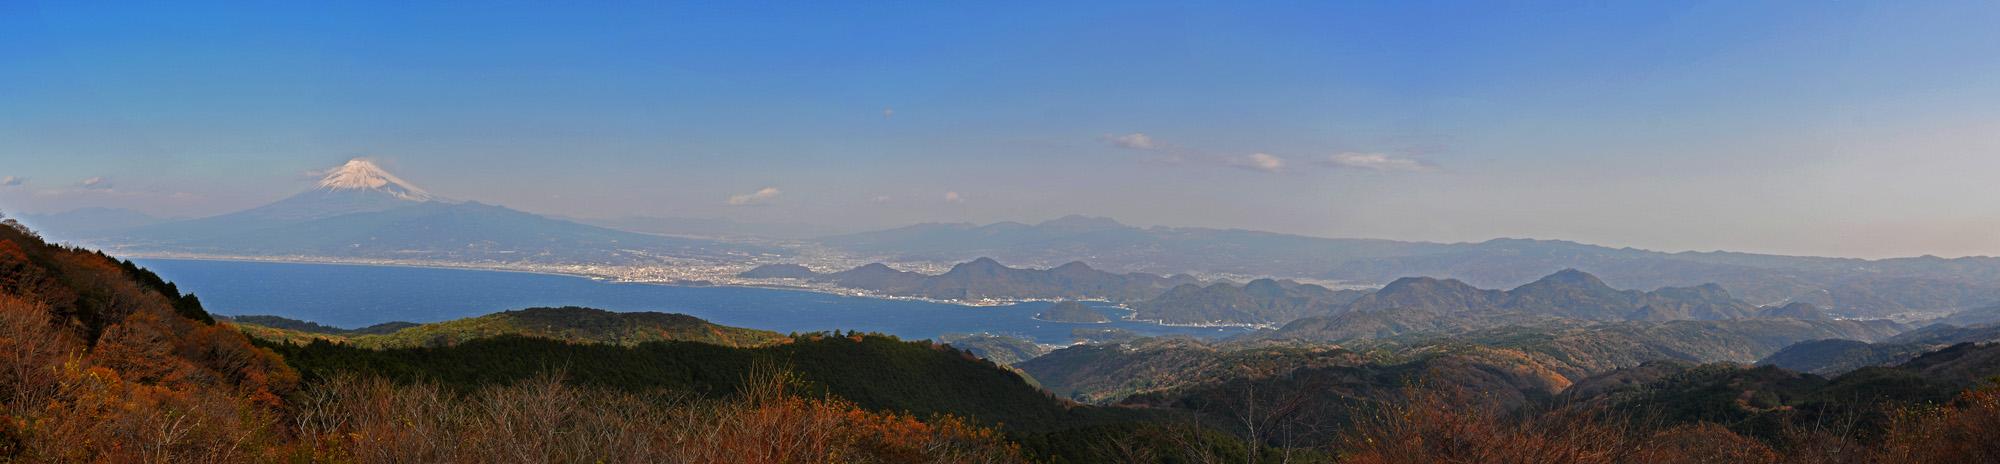 達磨山高原REST HOUSE